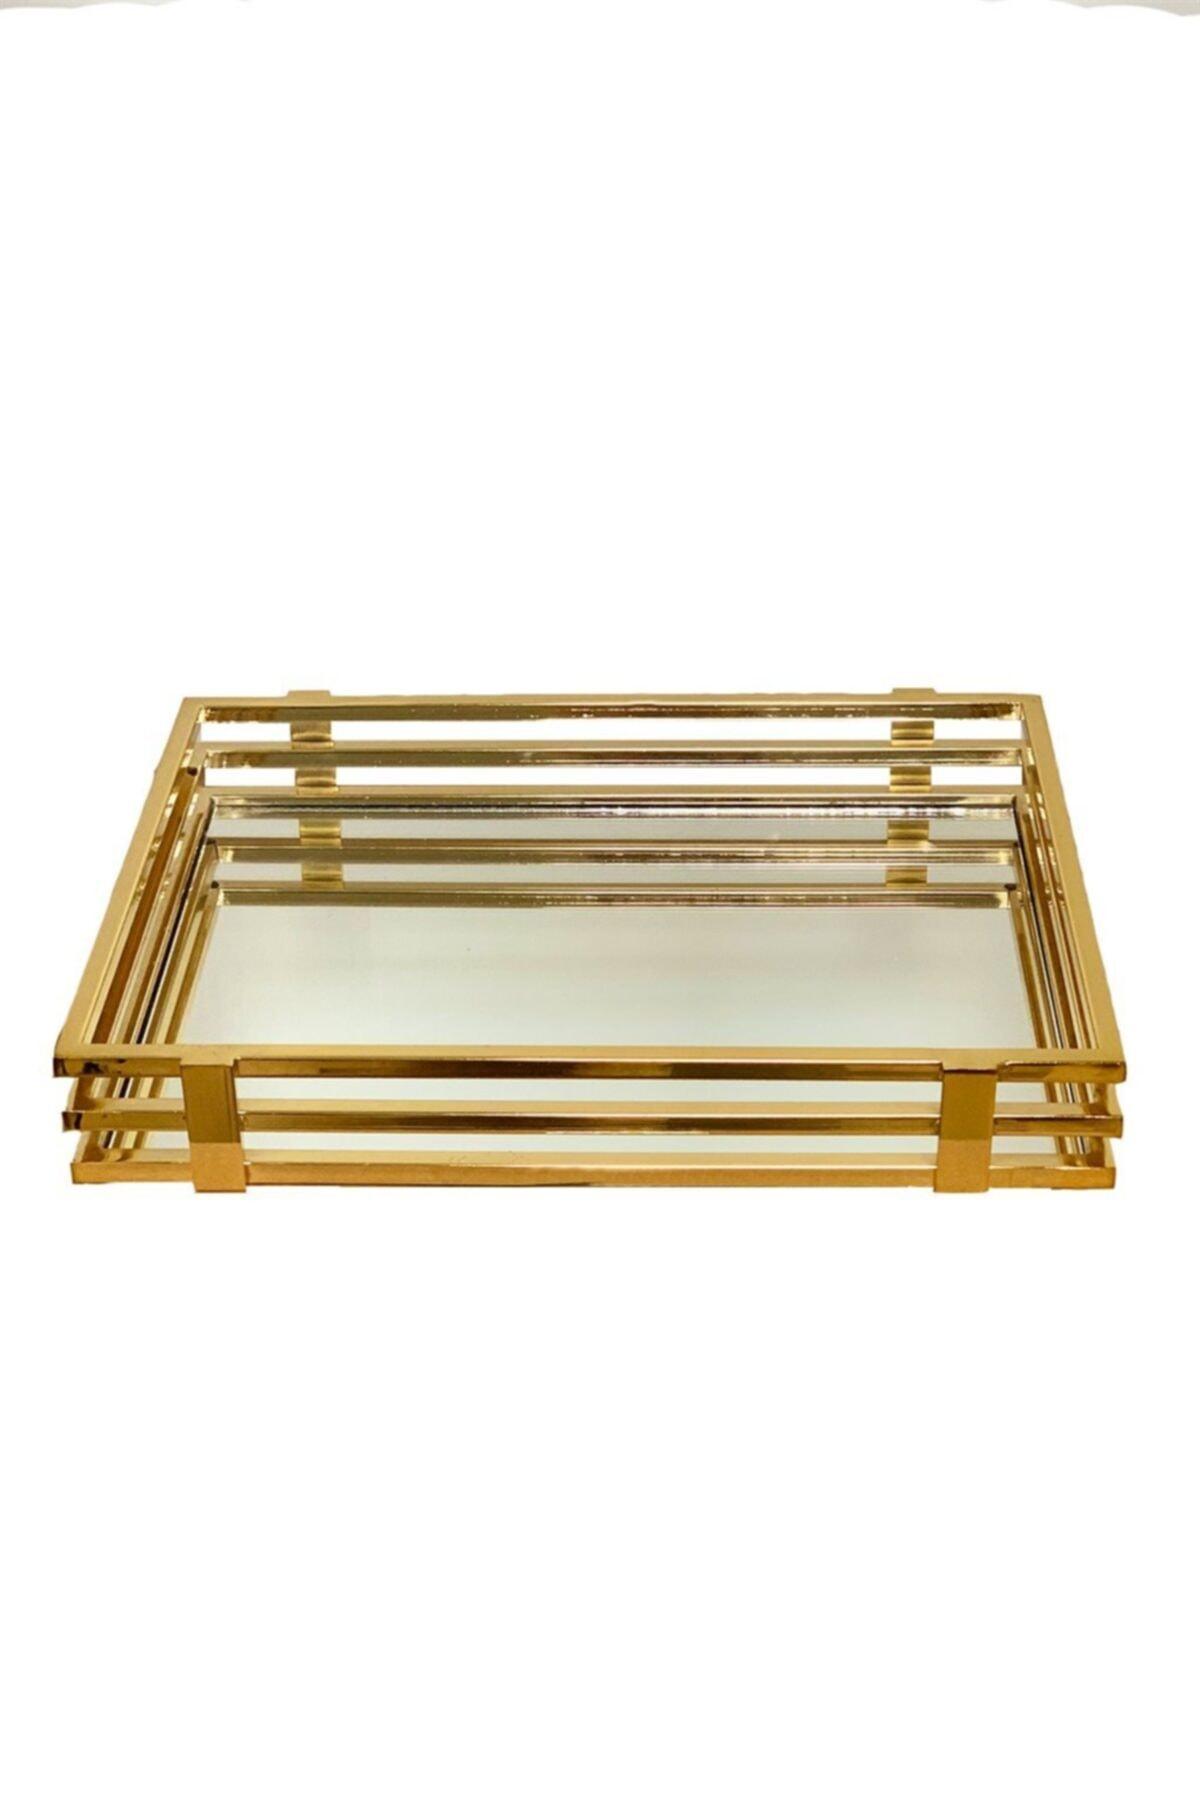 ARTER Home Gold Aynalı Dikdörtgen Tepsi